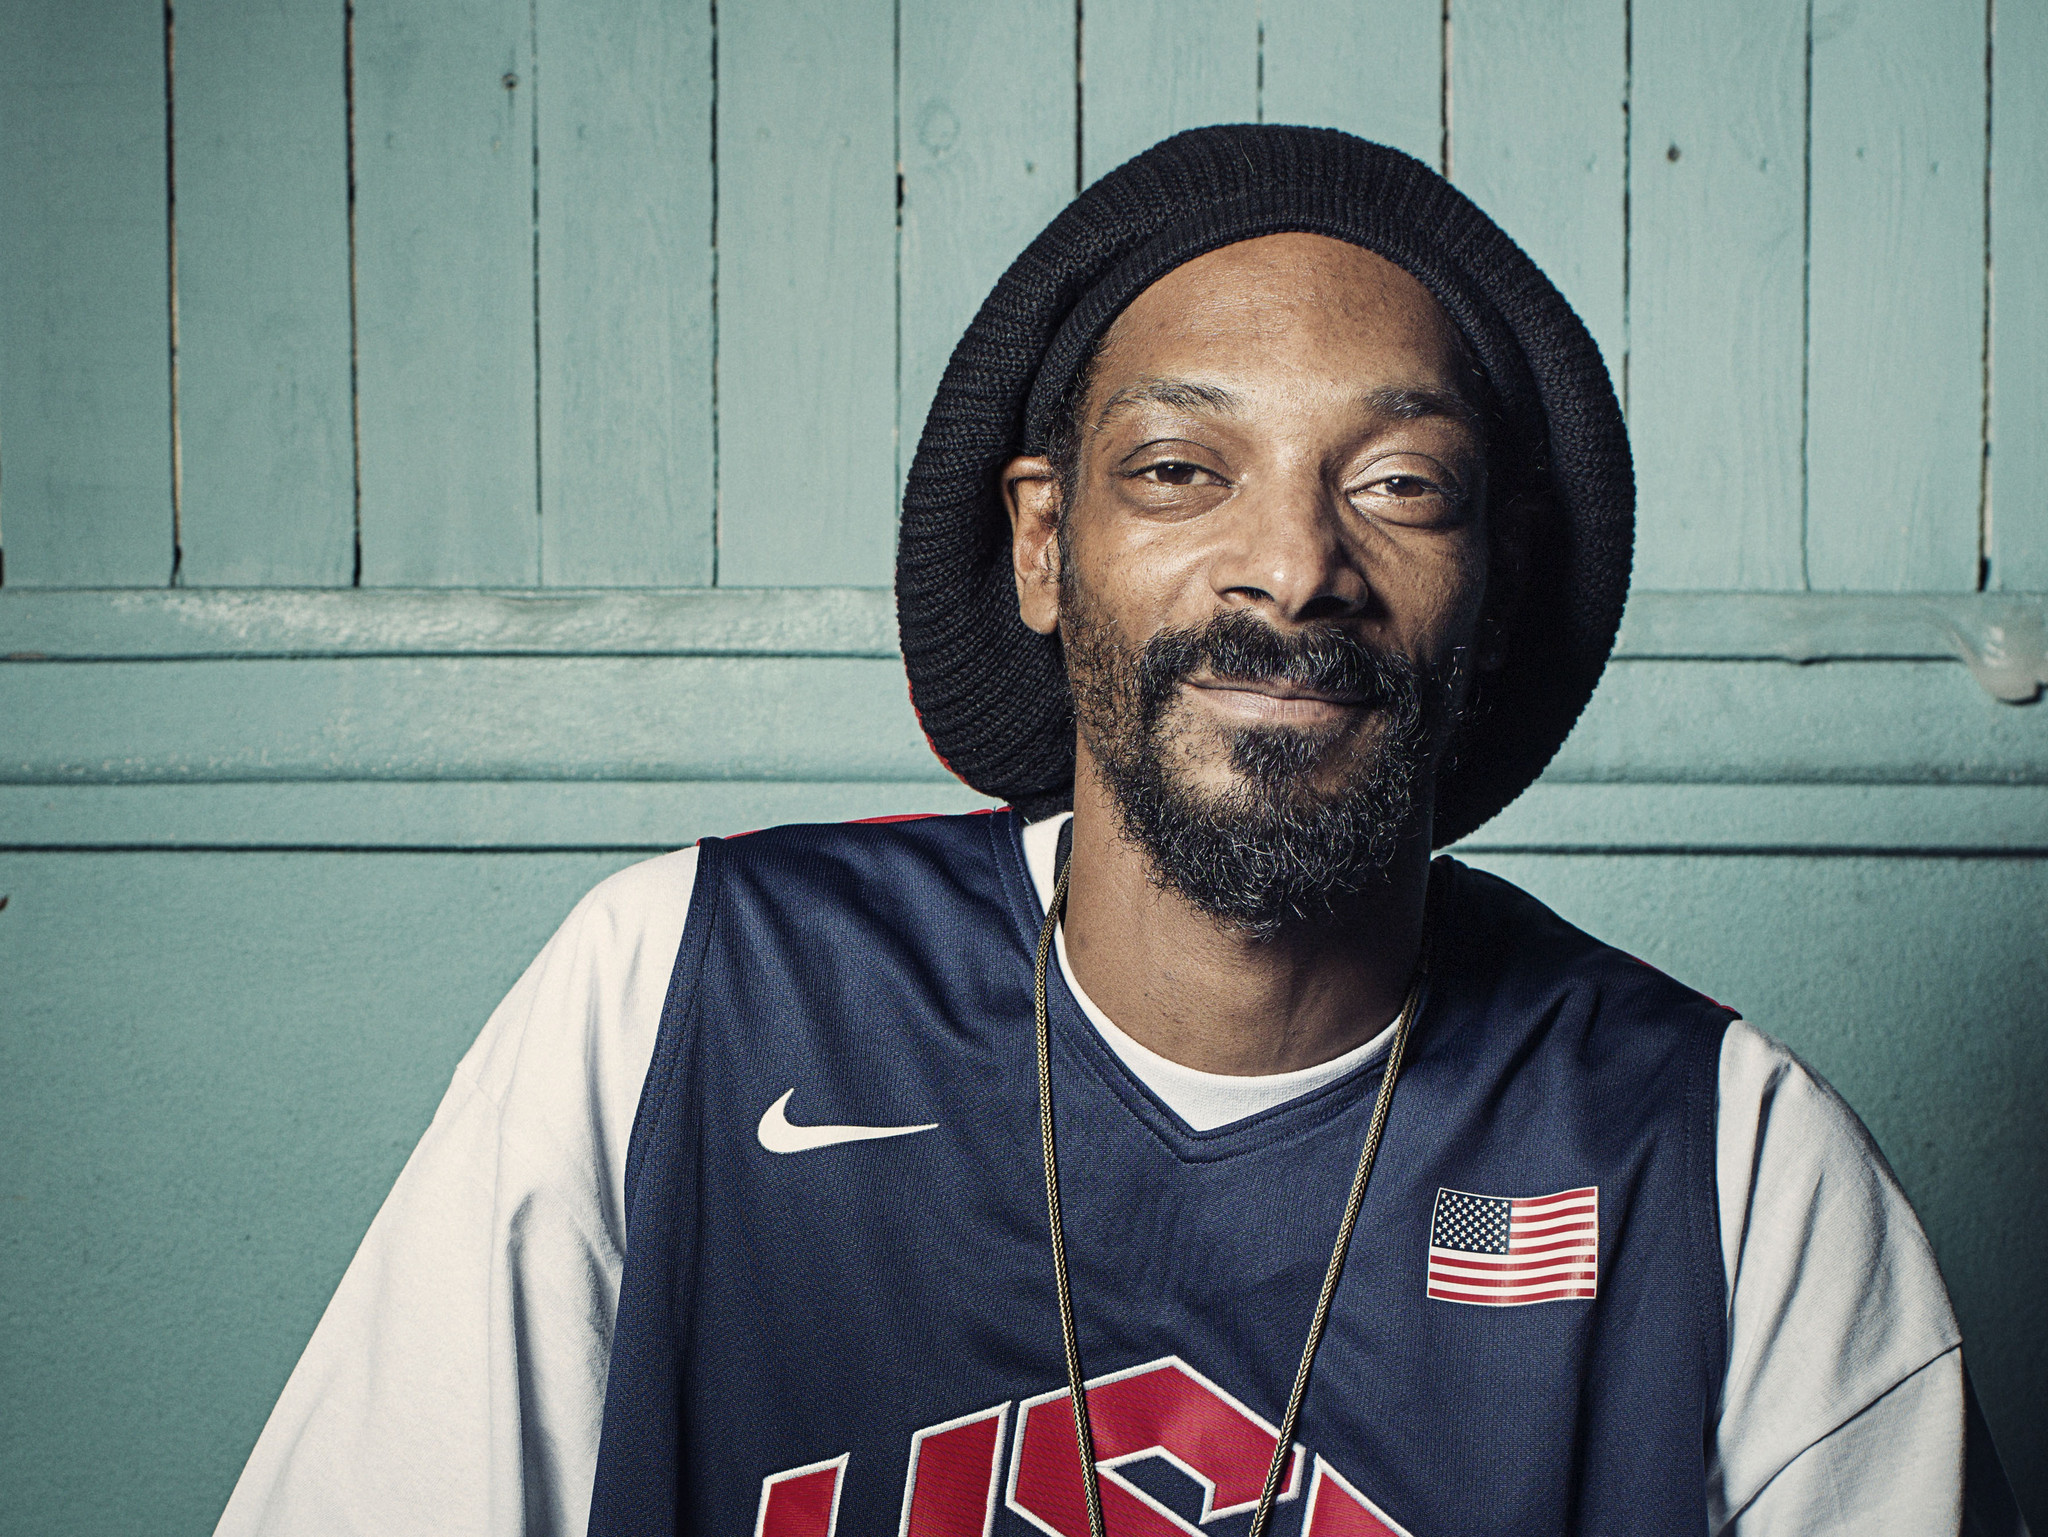 Snoop Dogg named keynote speaker for South By Southwest fest